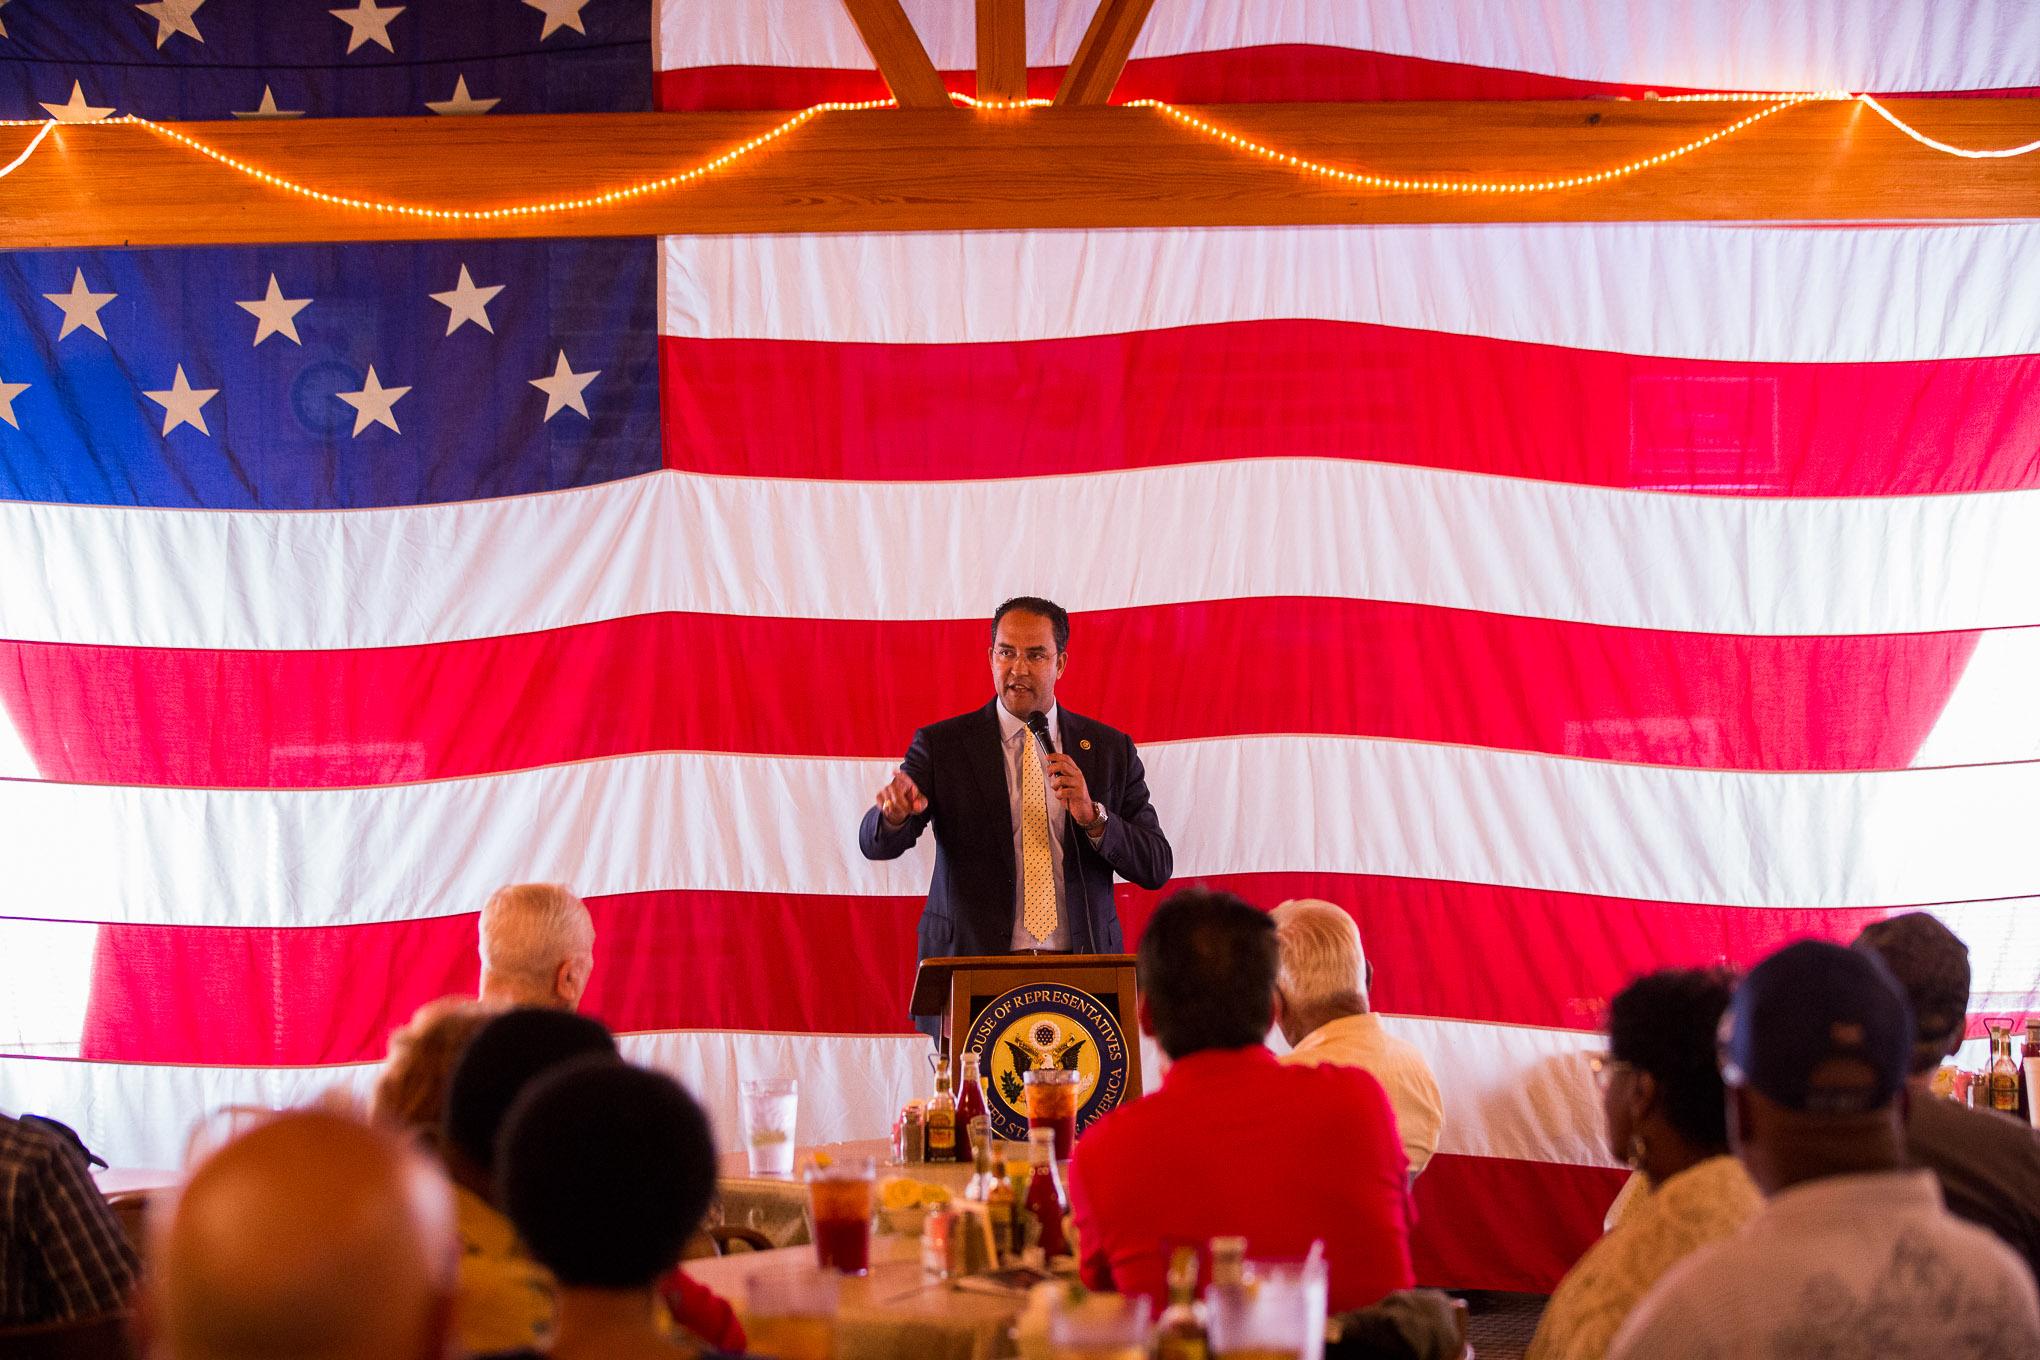 U.S. Rep. Will Hurd (R-San Antonio) thanks the Veterans for their service.